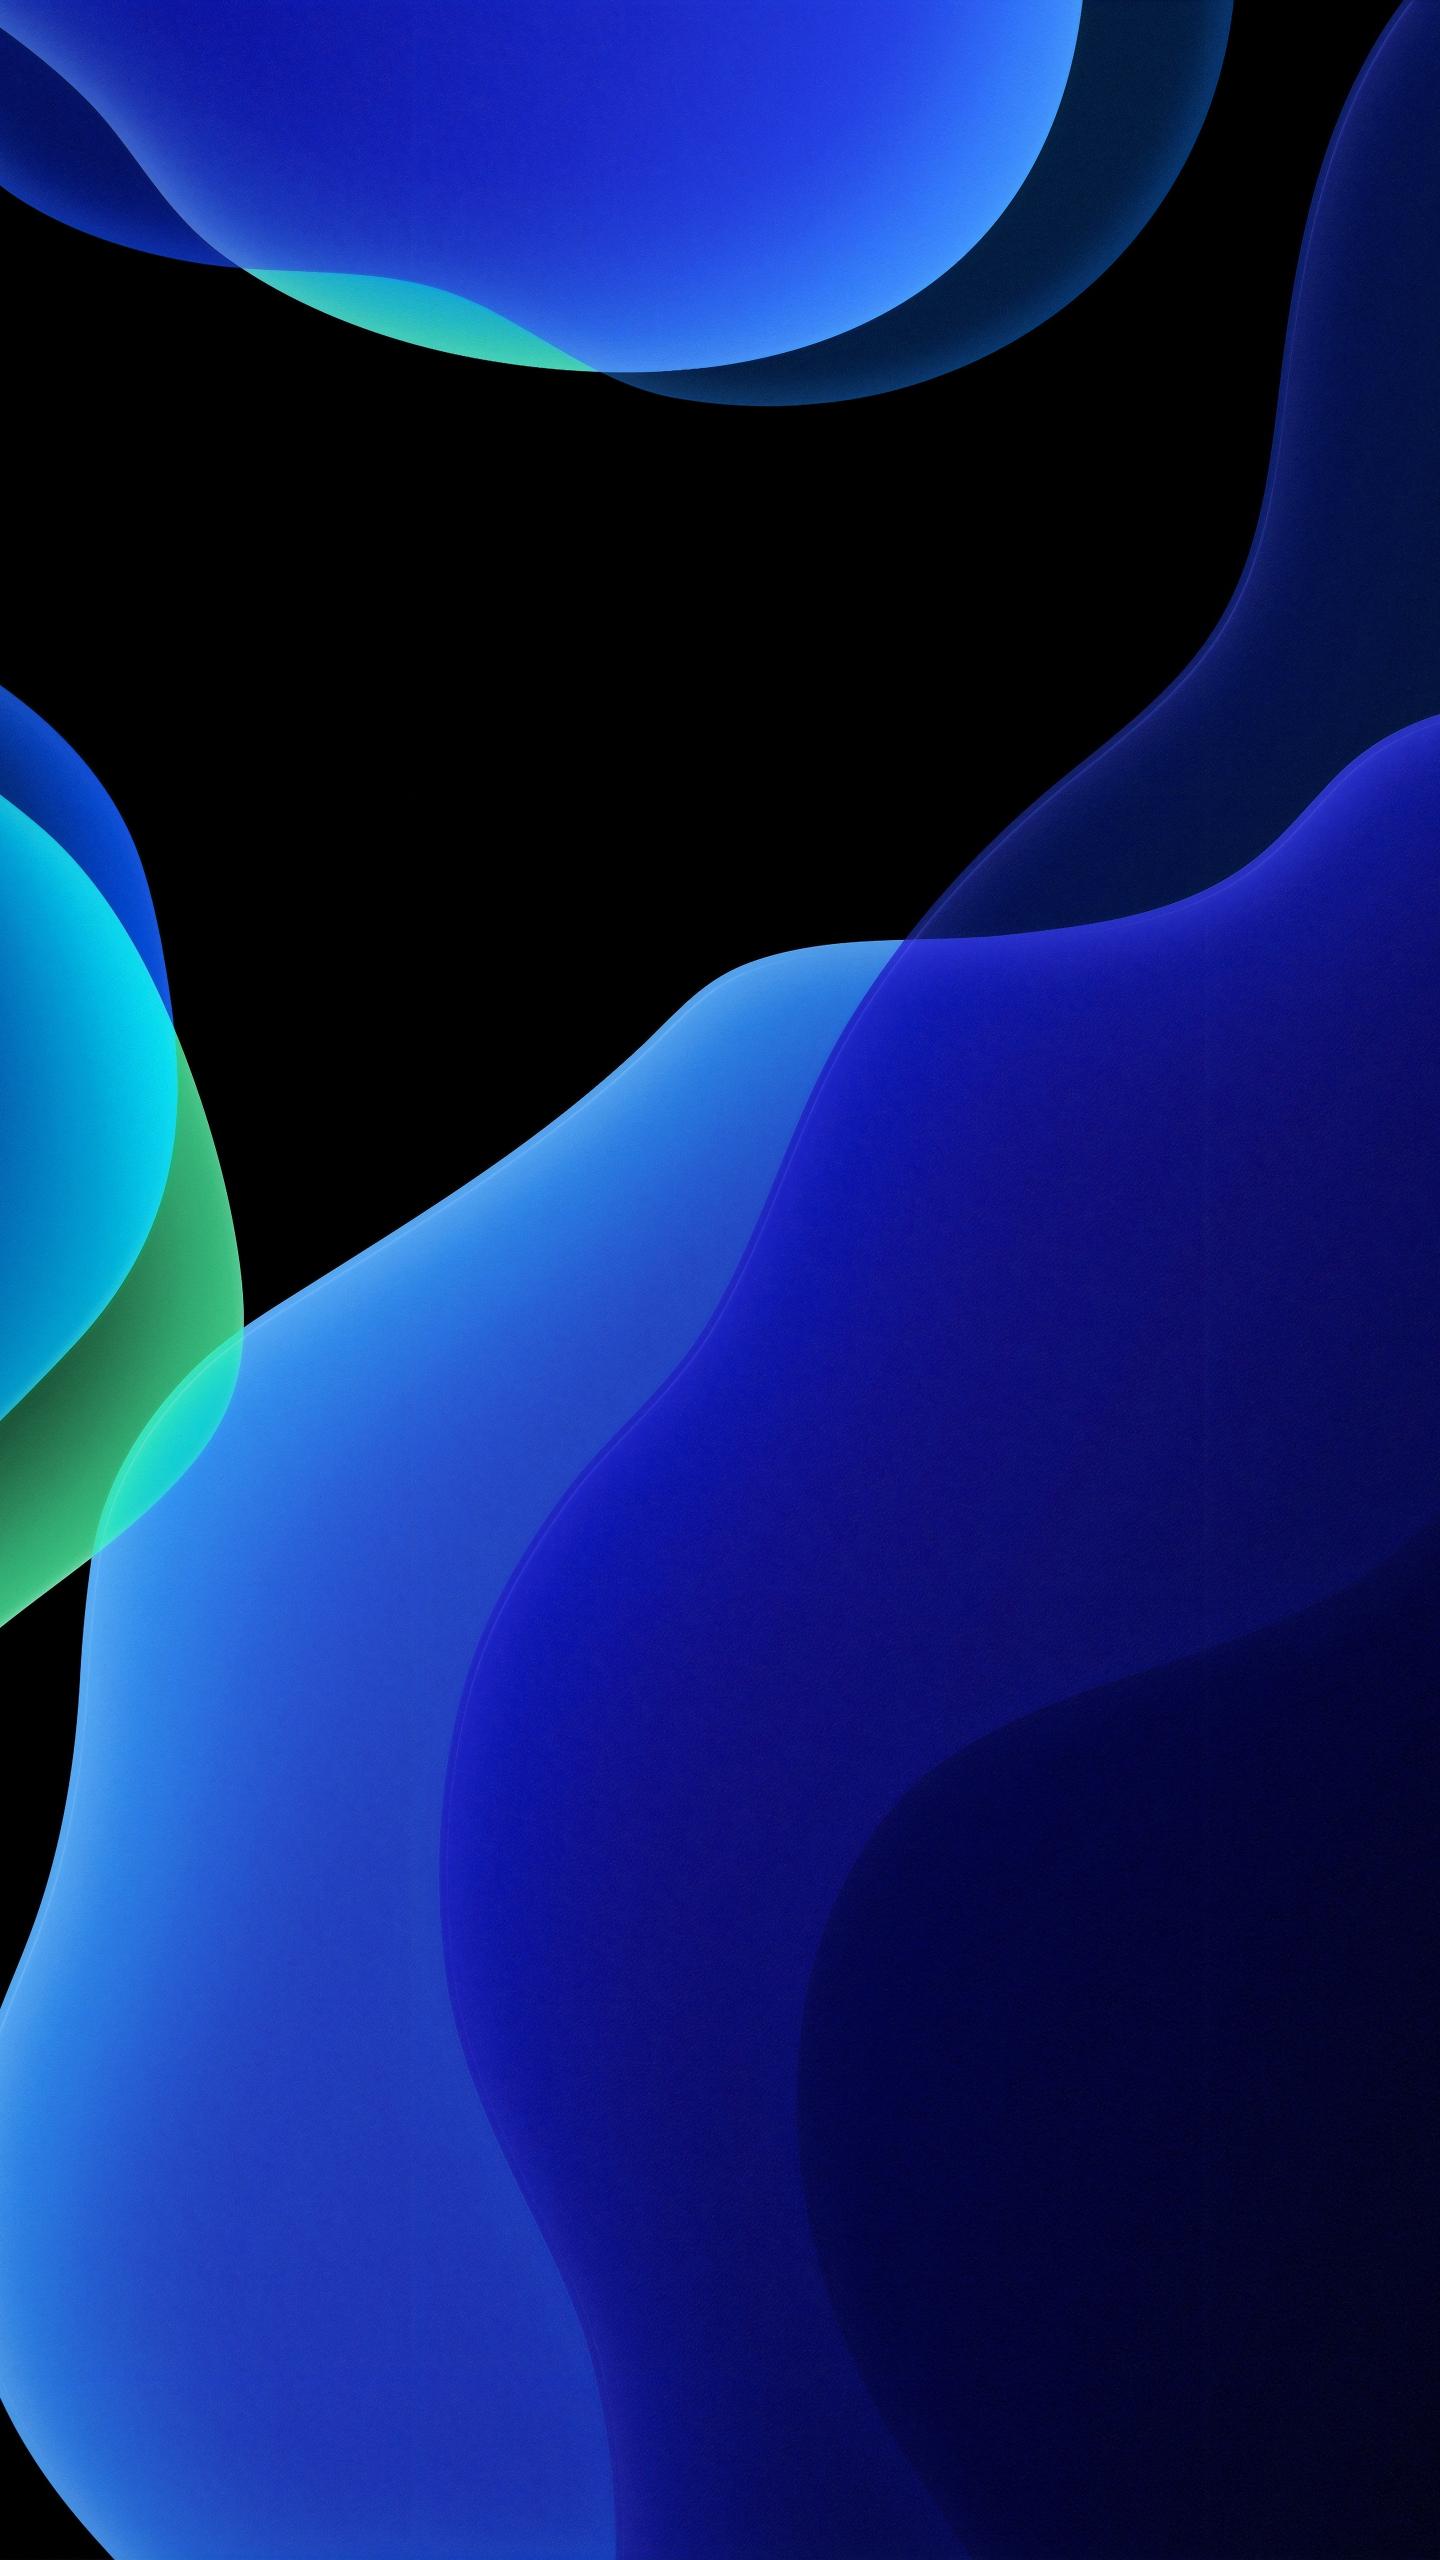 Download 1440x2560 Wallpaper Dark Blue Ios 13 Abstract Qhd Samsung Galaxy S6 S7 Edge Note Lg G4 1440x2560 Hd Image Background 21710